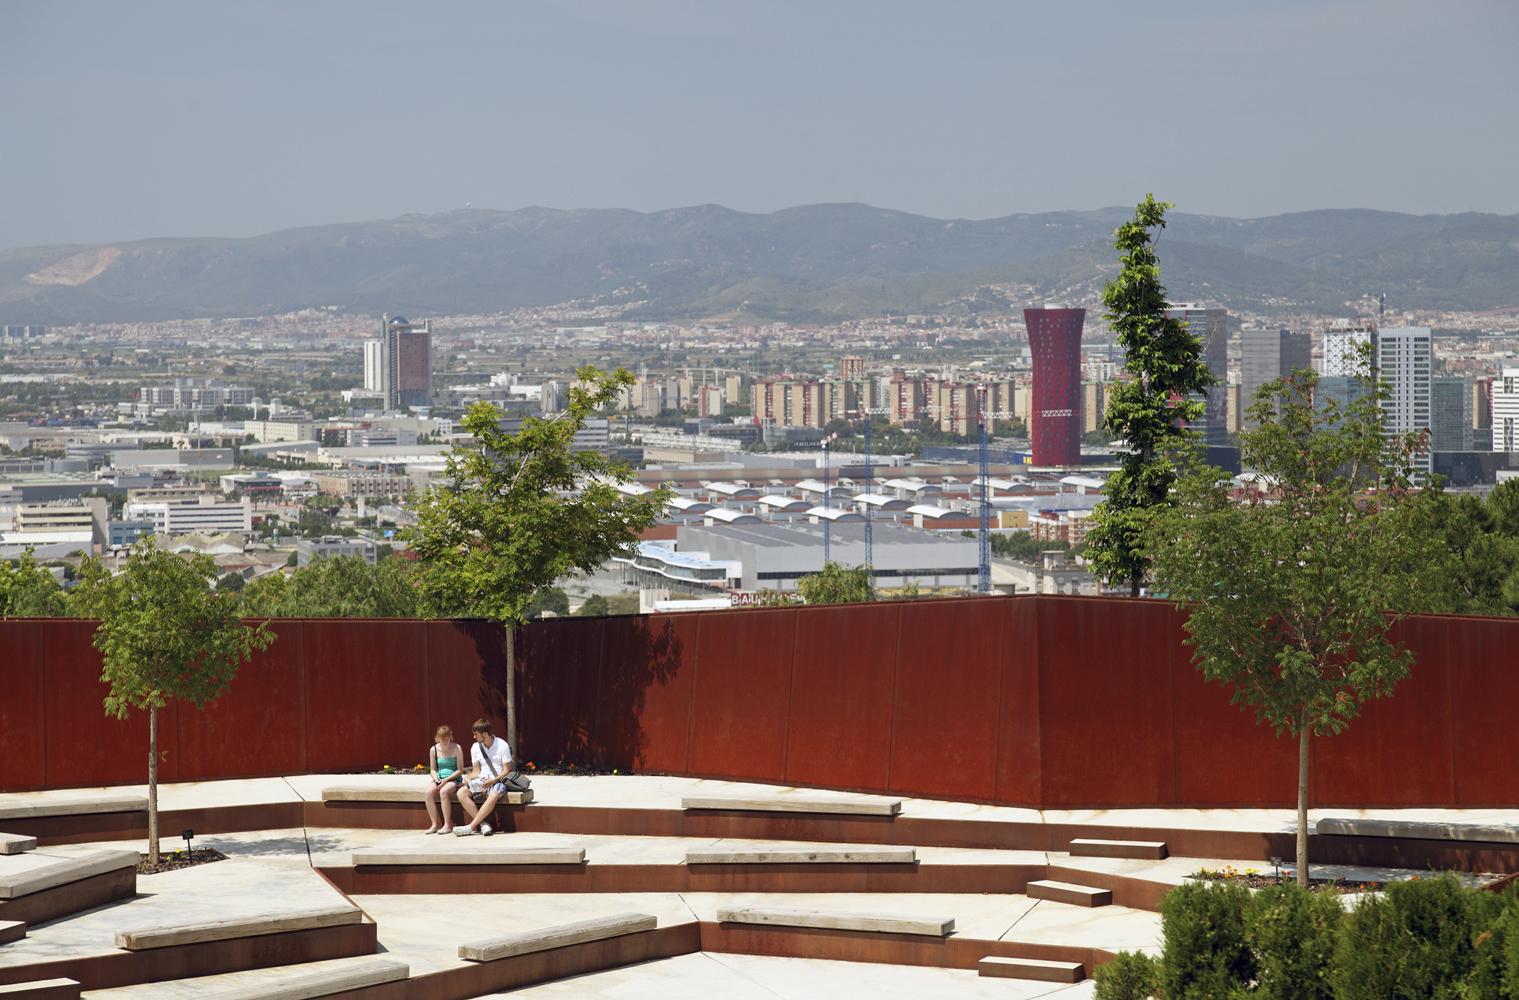 Jard n bot nico de barcelona marcela grassi - Jardines de barcelona ...